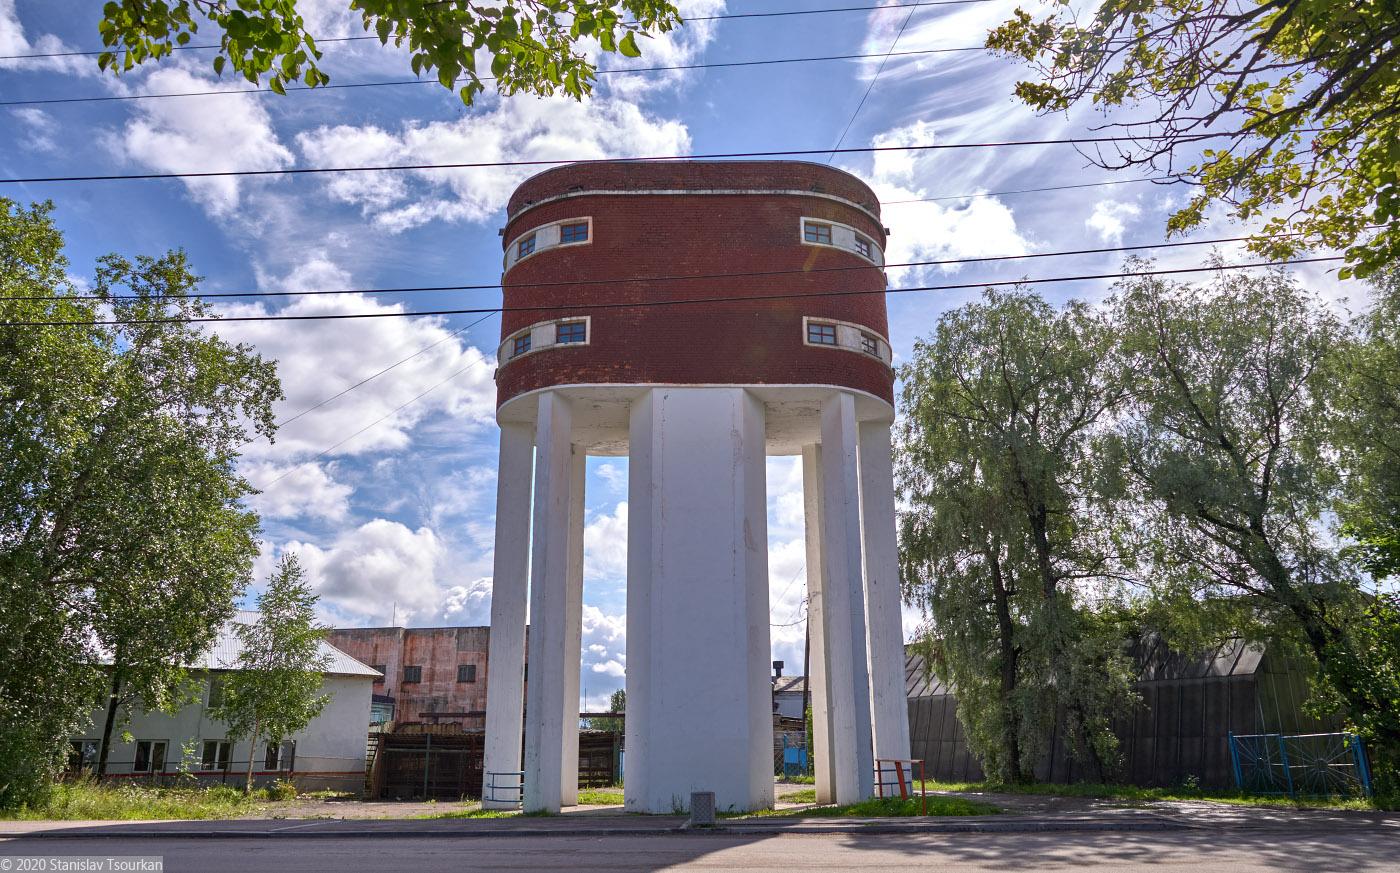 Карелия, республика Карелия, Сортавала, russia, karjala, sortavala, водонапорная башня, водонапорка